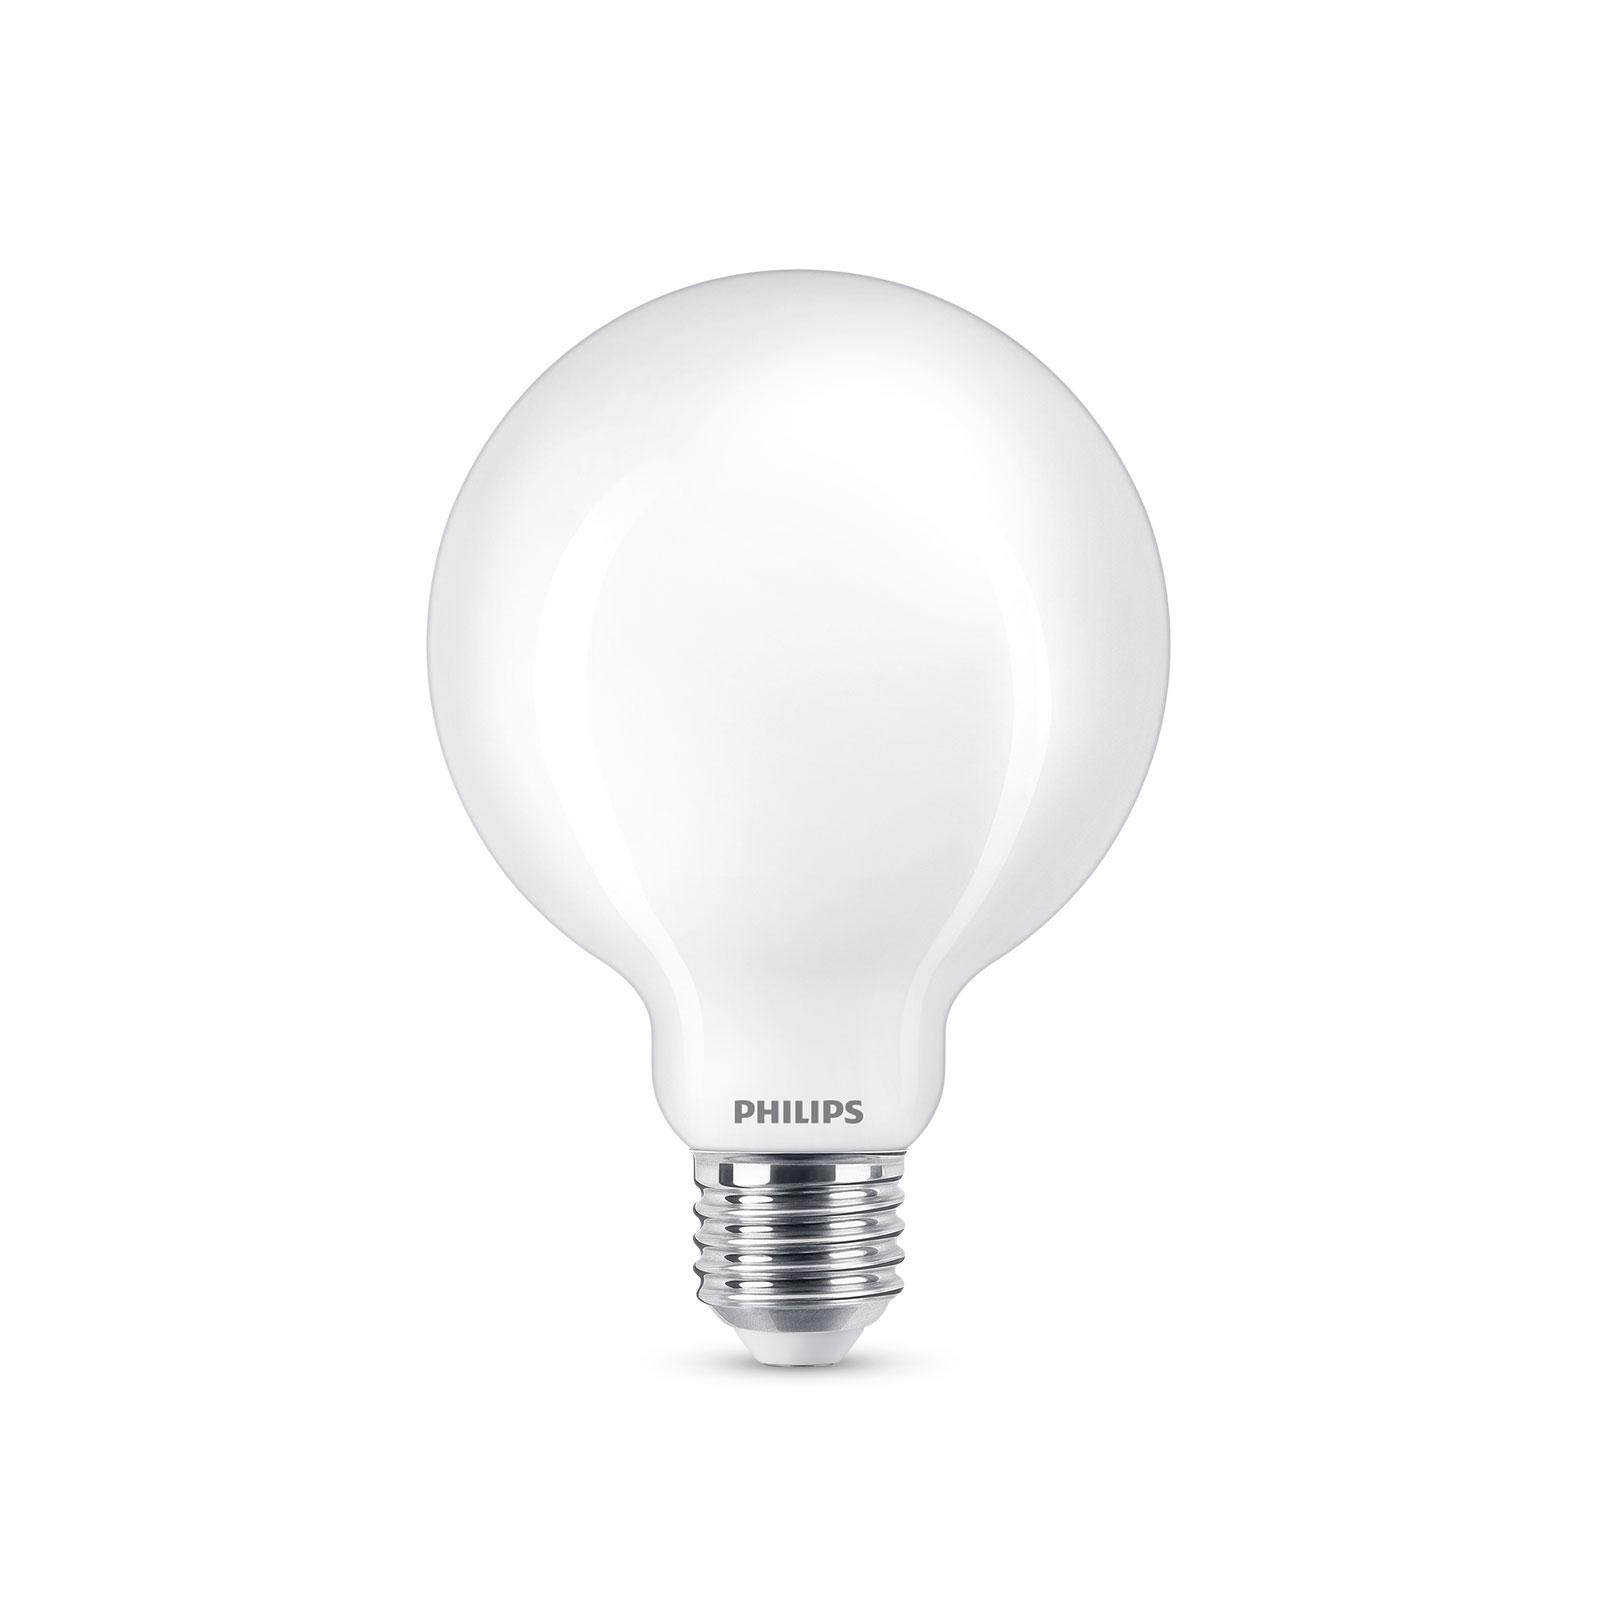 Philips LED-Globelampe E27 G93 7 W, 2.700 K, opal